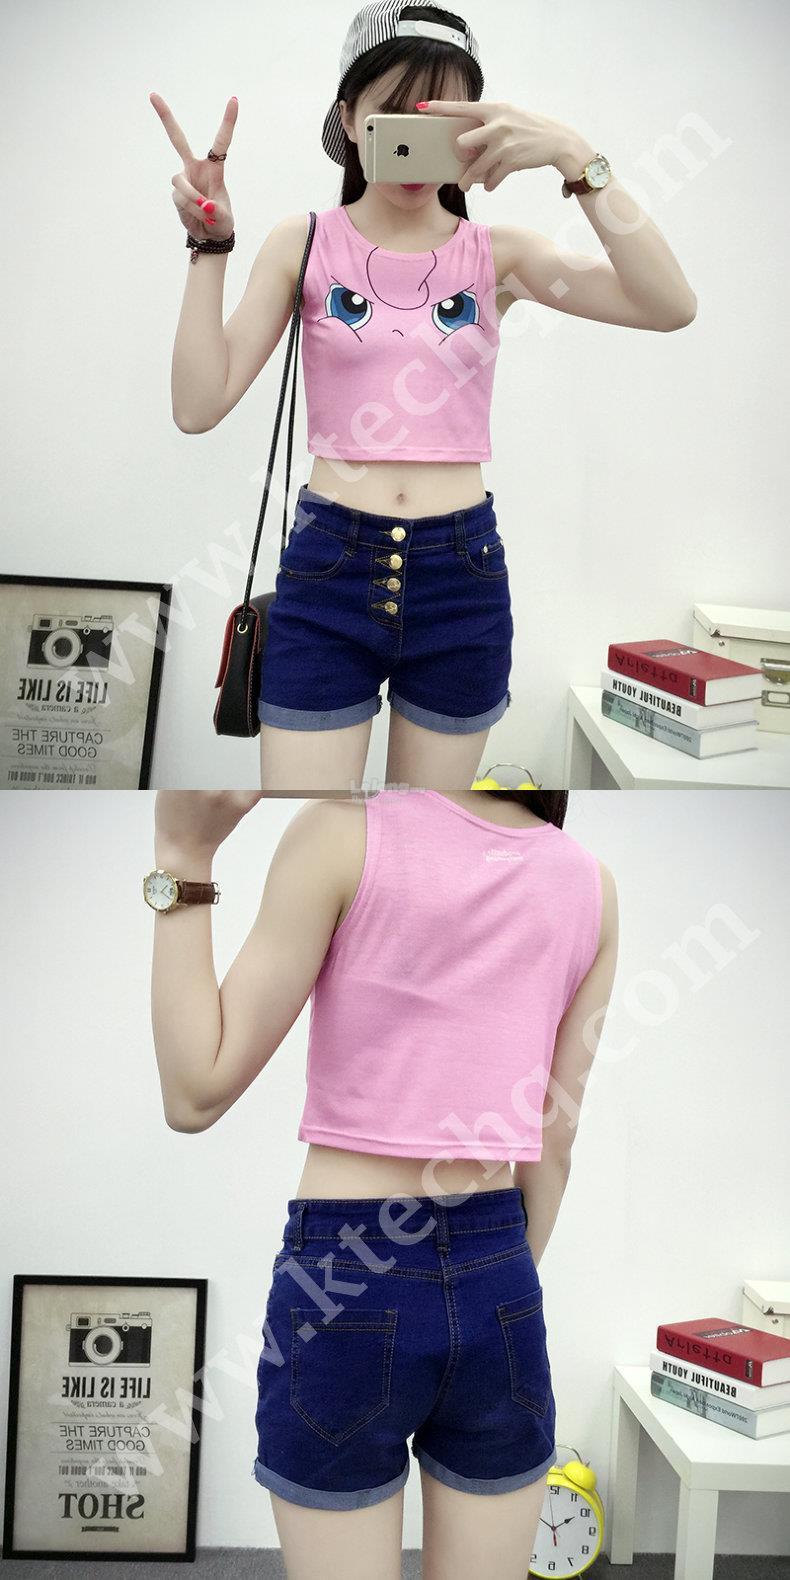 92fa3aff82b44 Fashion Pokemon Go Cartoon Cute Girl T Shirt Sexy - Angry Jigglypuff